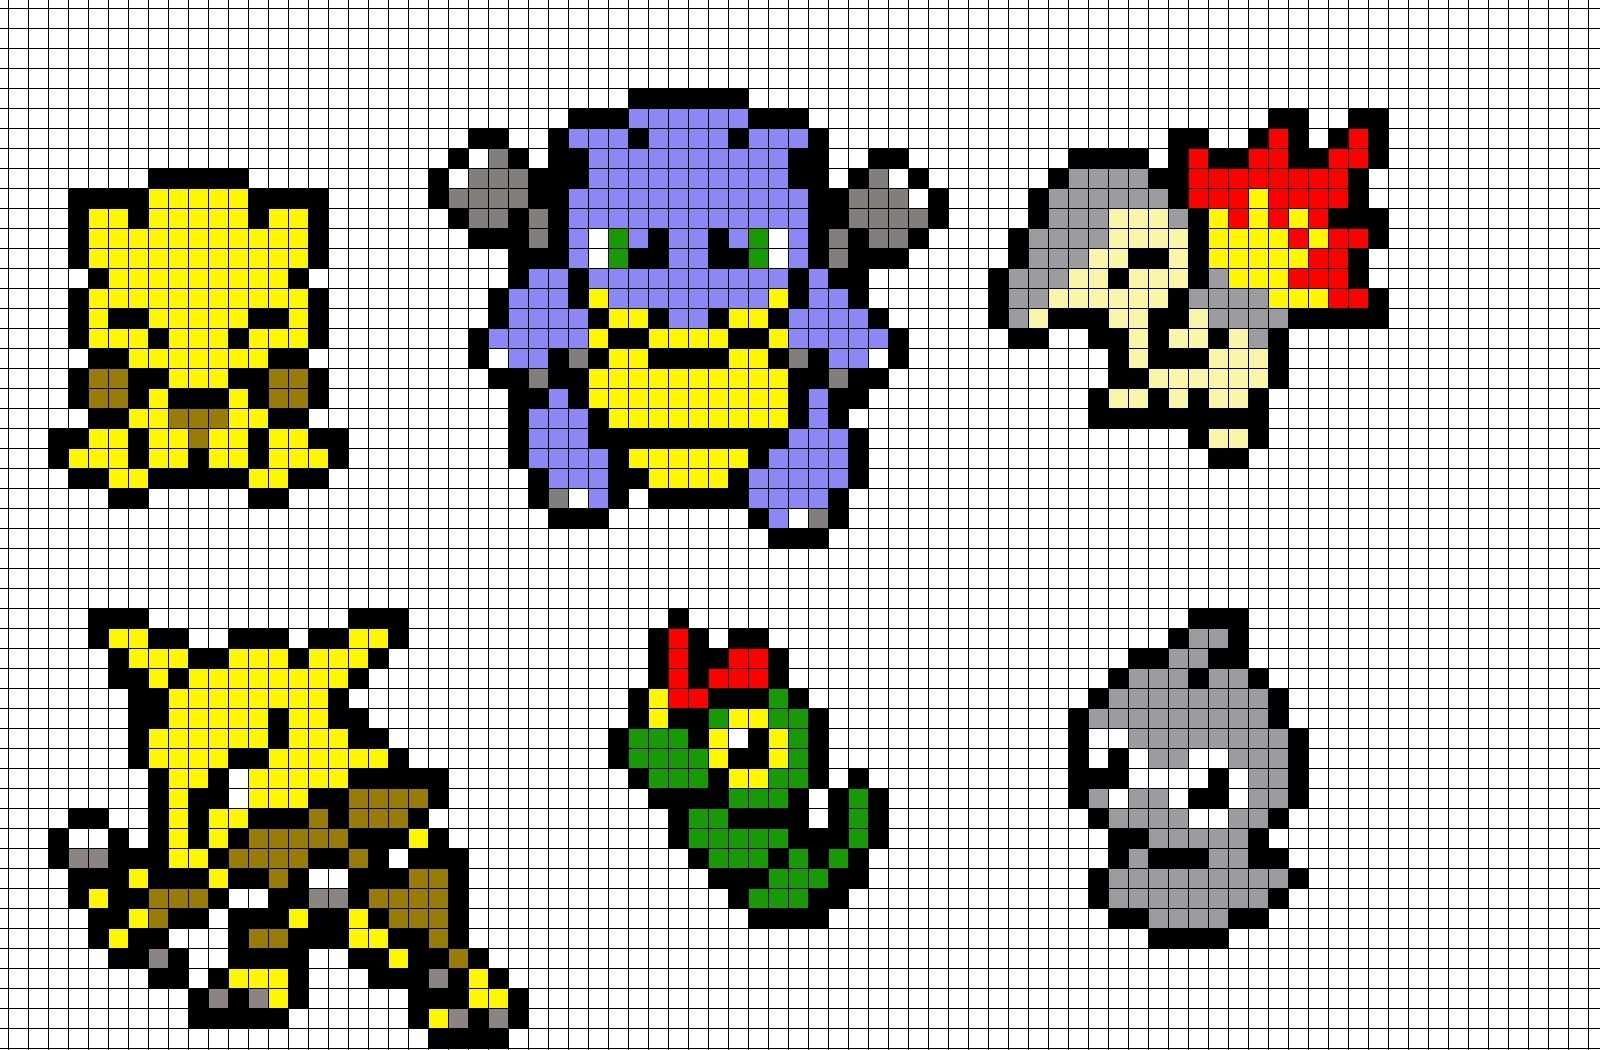 Pokemon Pixel Art By Brainless937 On Deviantart Pixel Art Pokemon Pixel Art Pokemon Cross Stitch